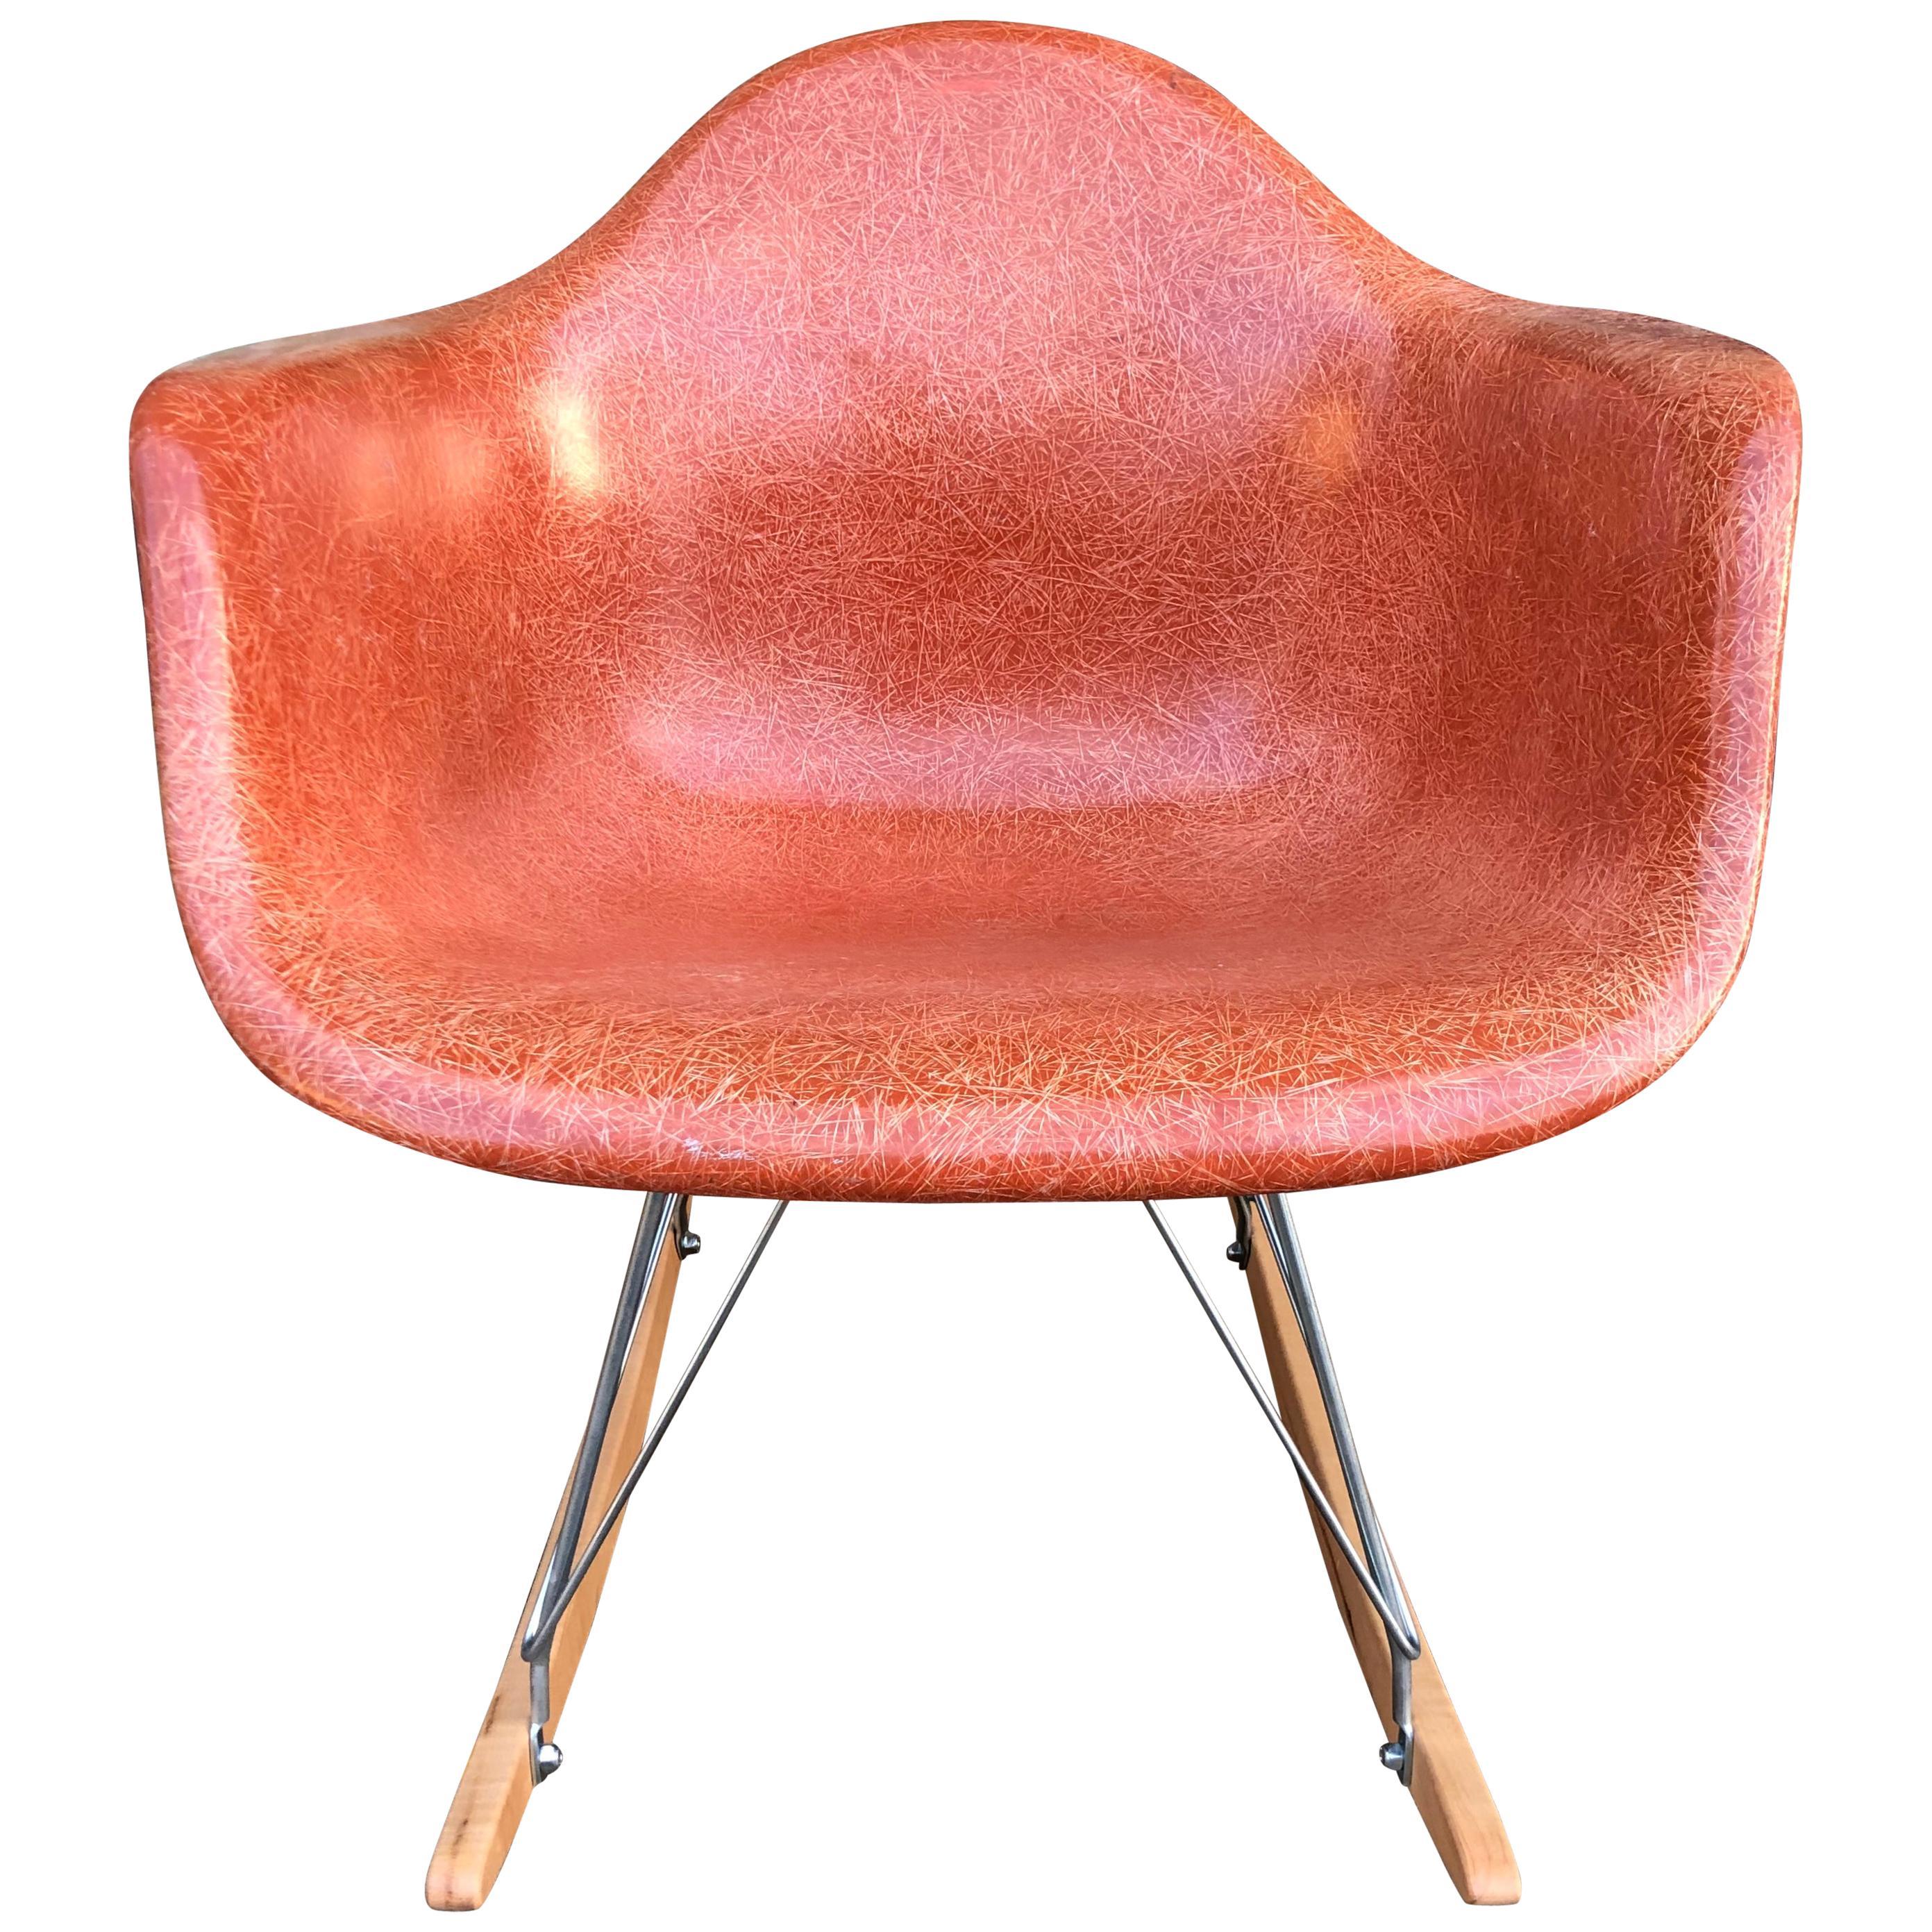 Terracotta Herman Miller Eames RAR Rocking Chair